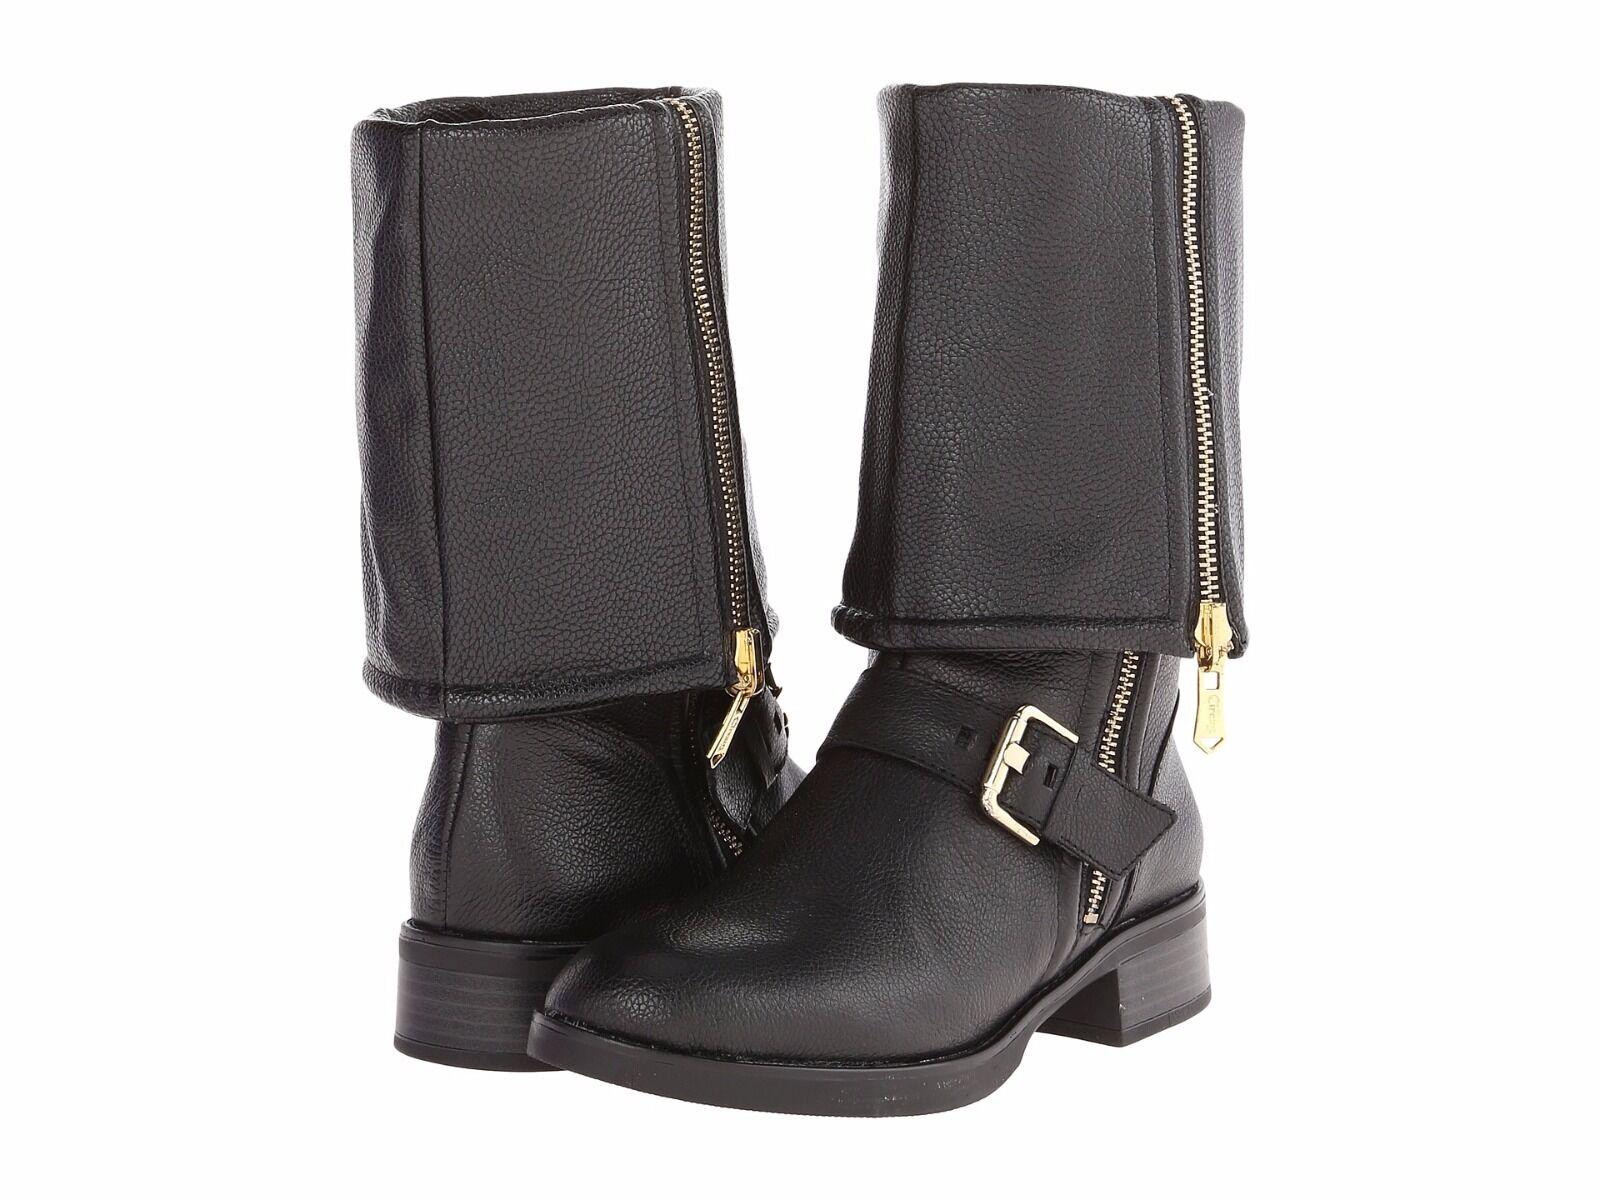 Women's Circus by Sam Edelman Randi Black Leather Size 8.5 MSRP 180$